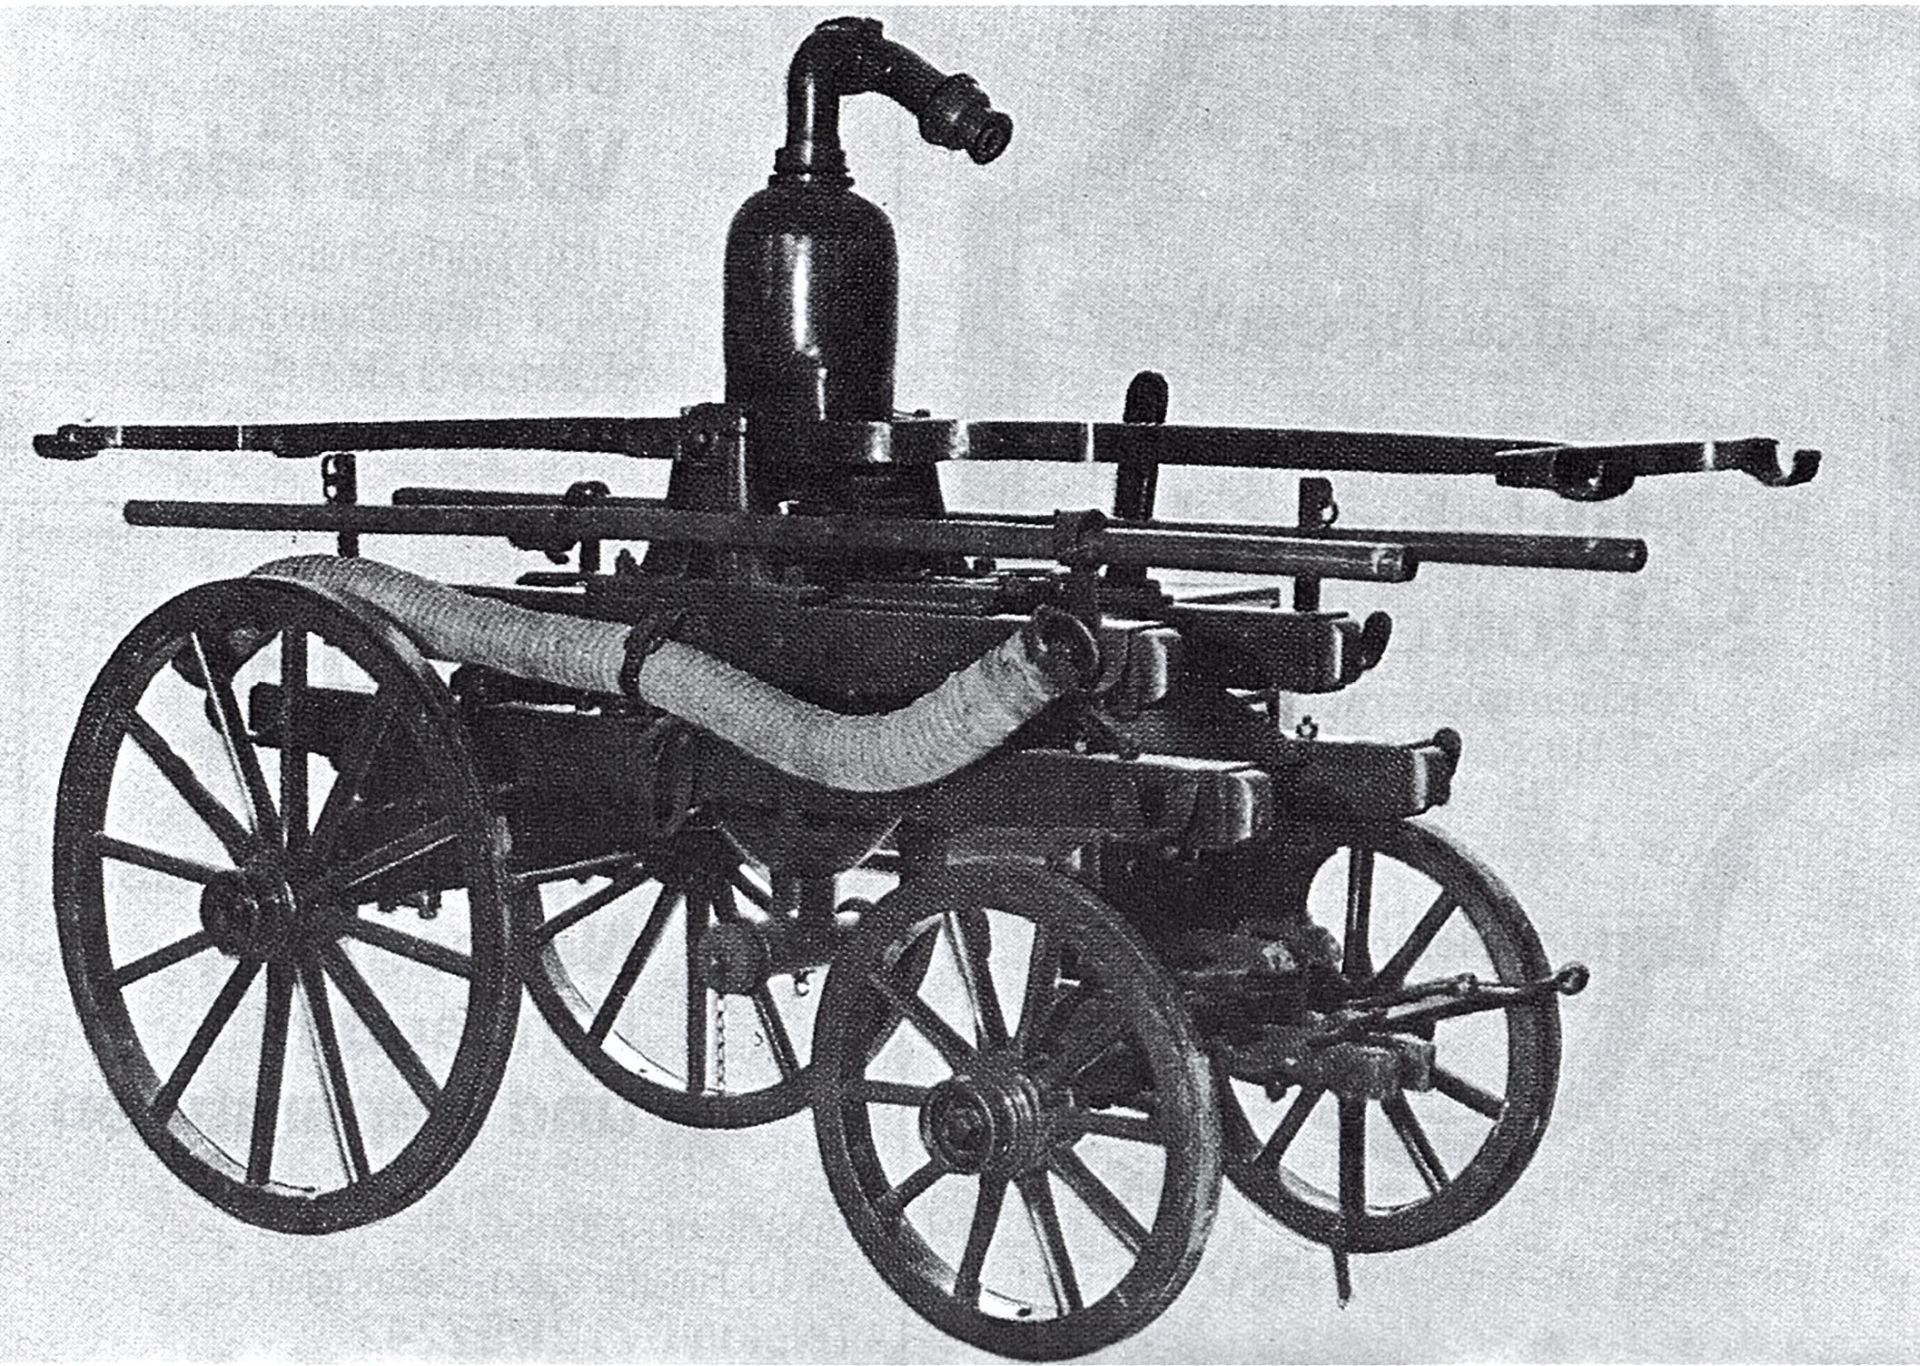 Druckverstärkerpumpe aus dem Jahr 1880